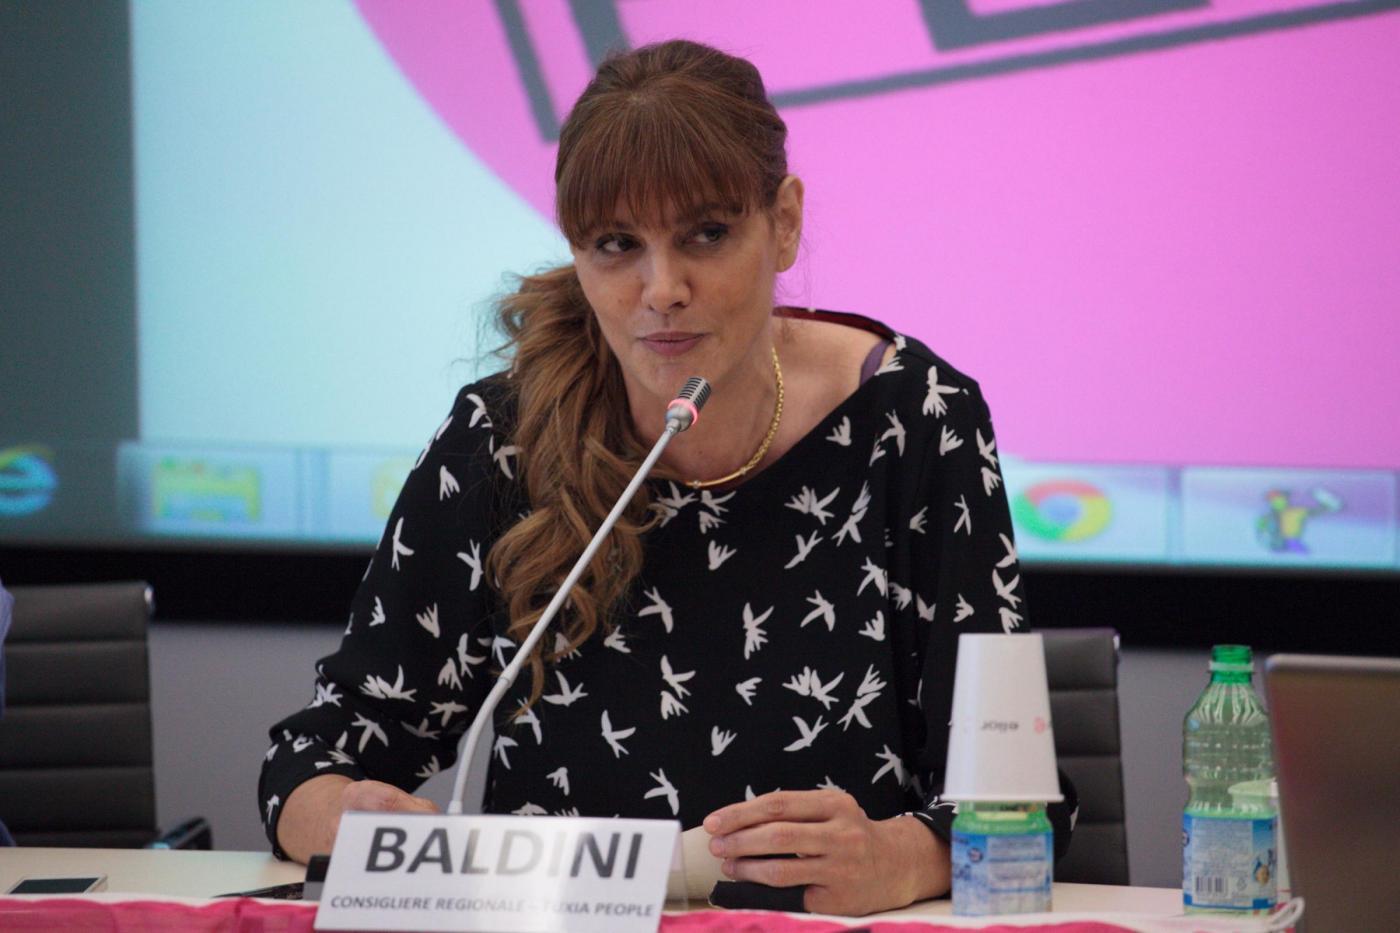 Maria Teresa Baldini